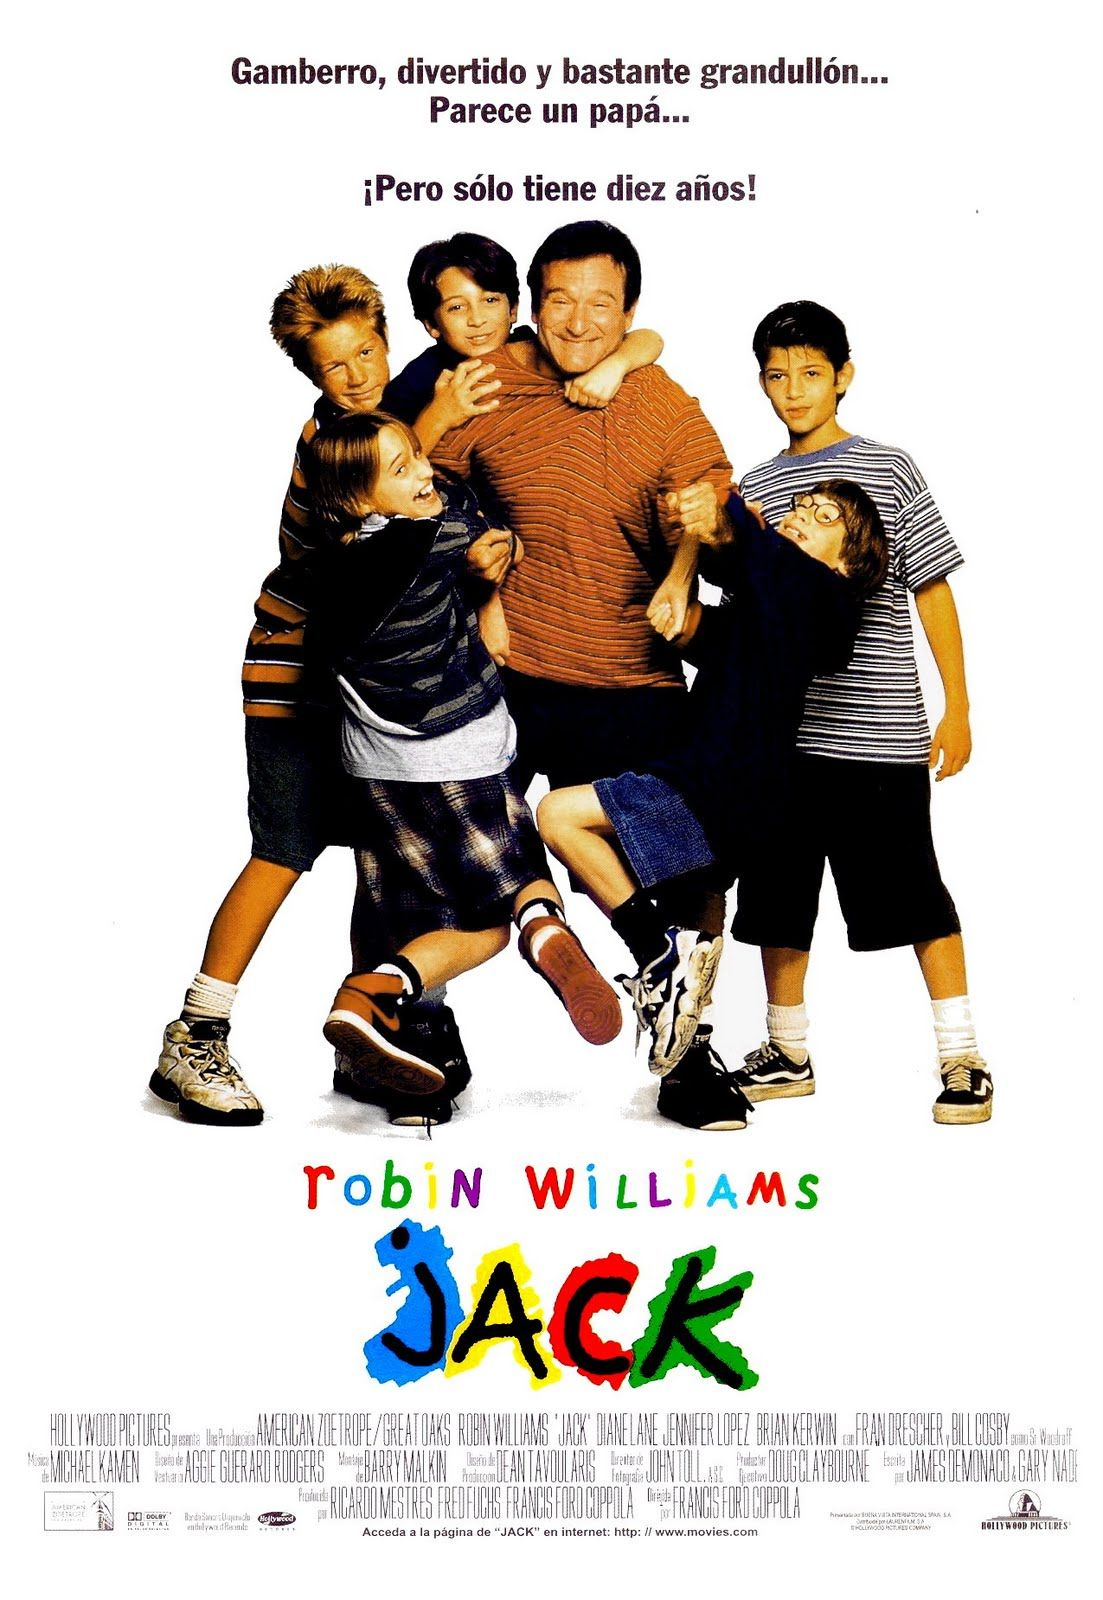 Jack (1996) | Robin williams, Robin williams movies, Robin williams jack